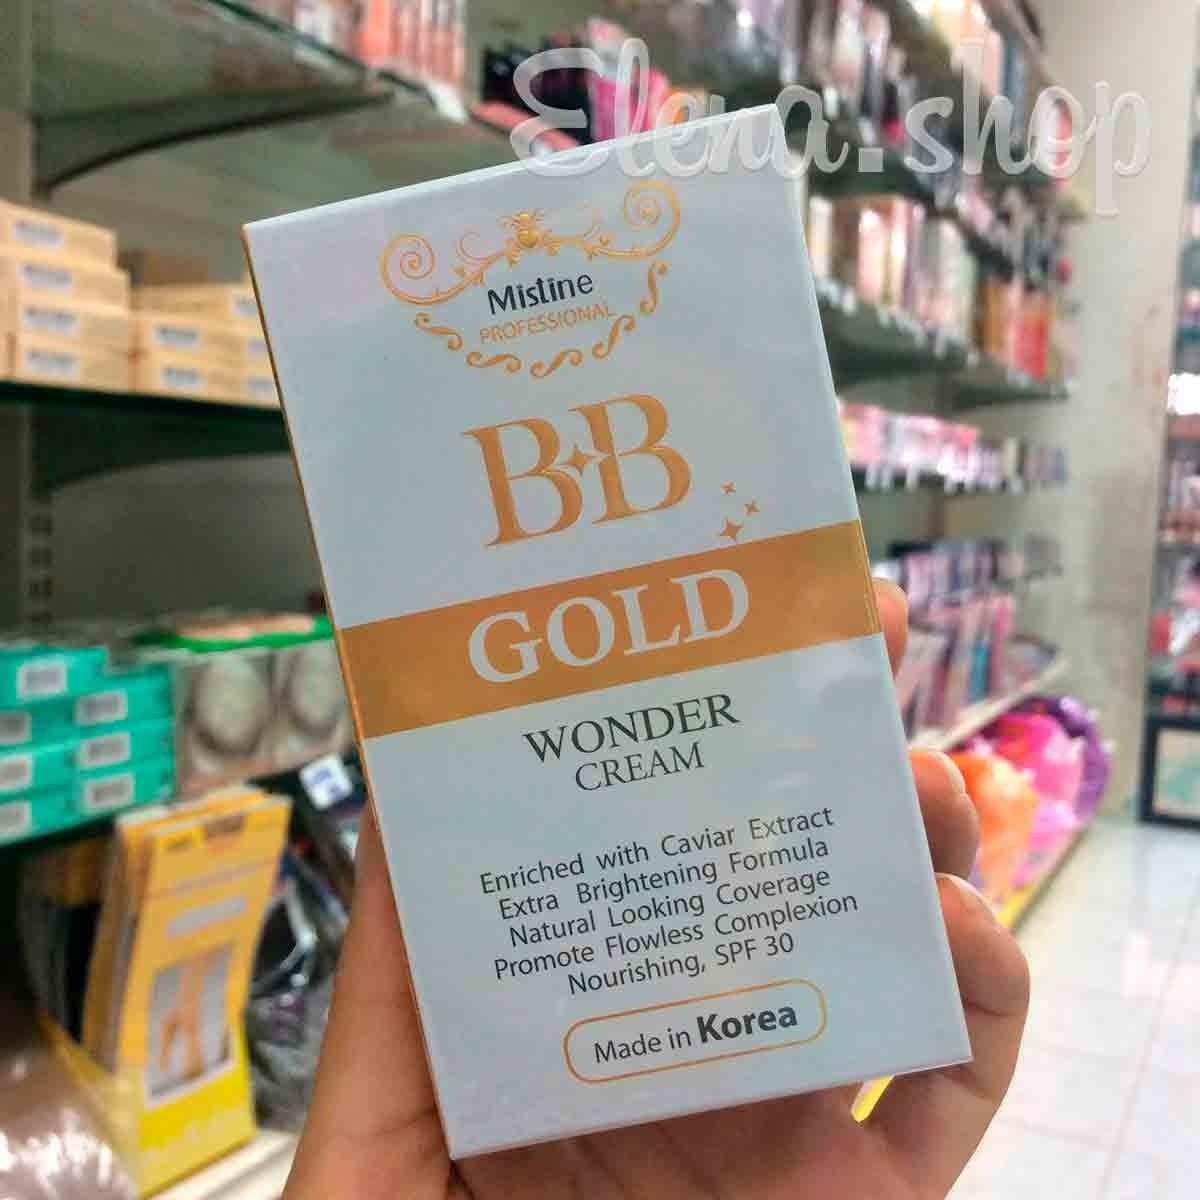 BB крем на основе черной икры Gold wonder Mistine